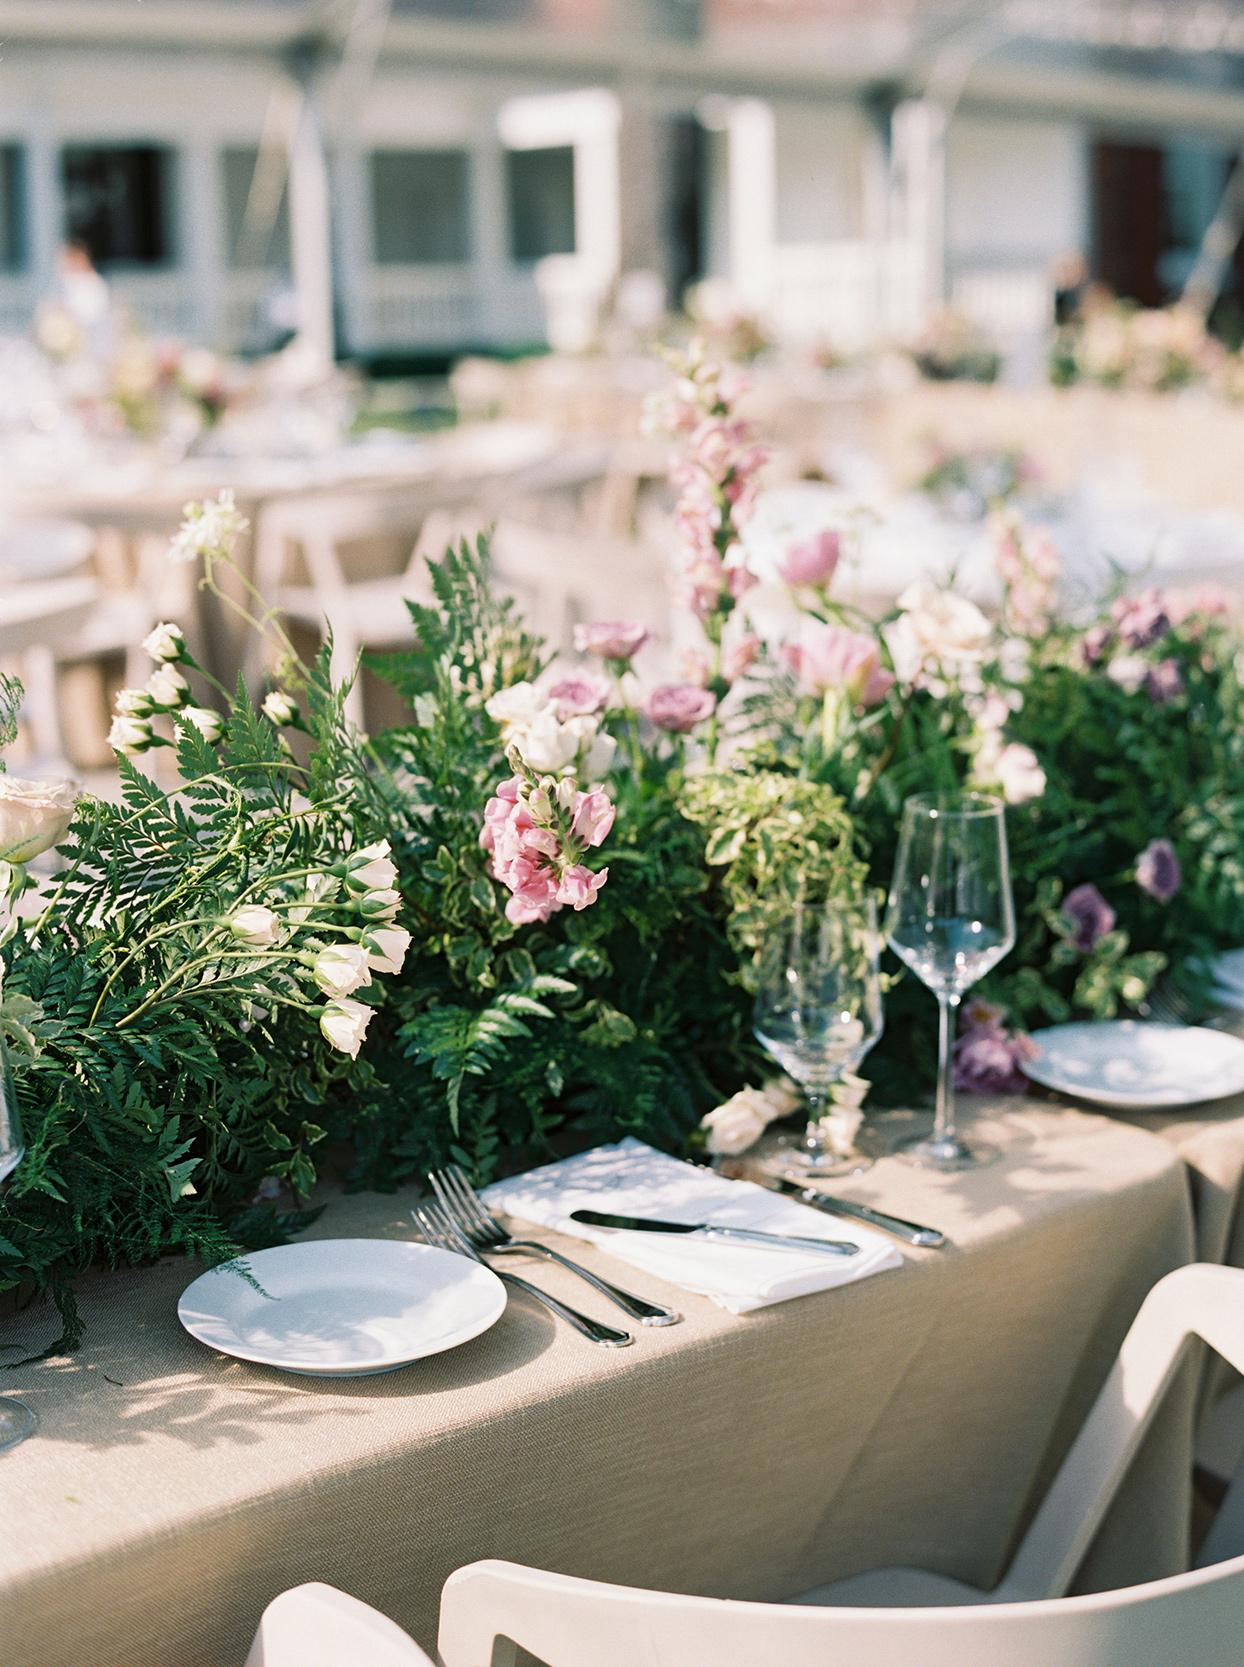 julia doug wedding reception place setting long table